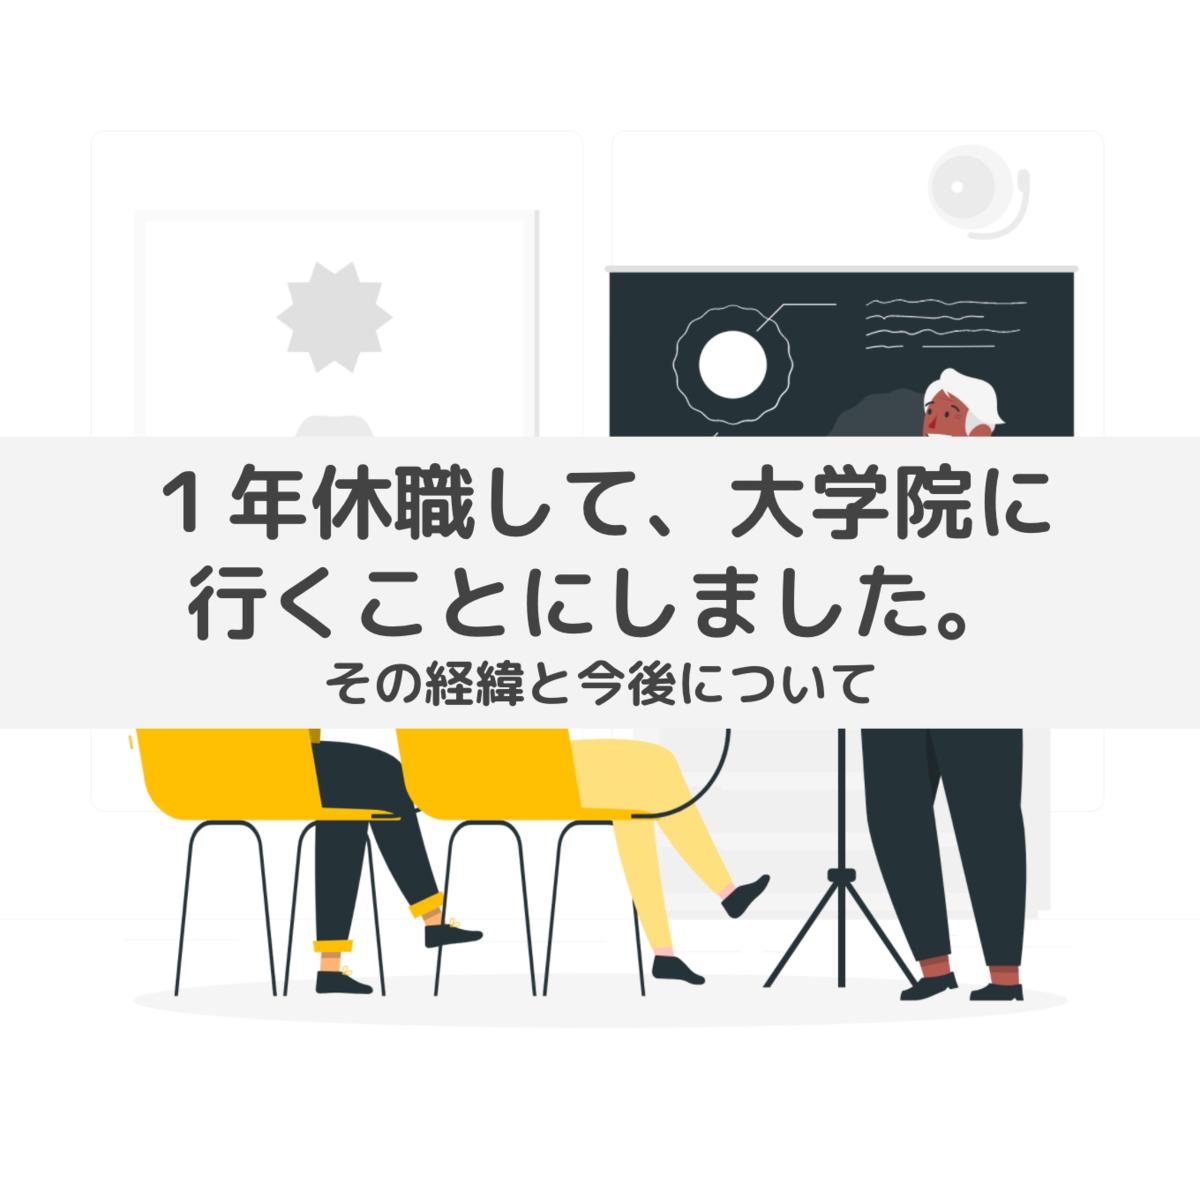 f:id:ninofku:20210309001054p:plain